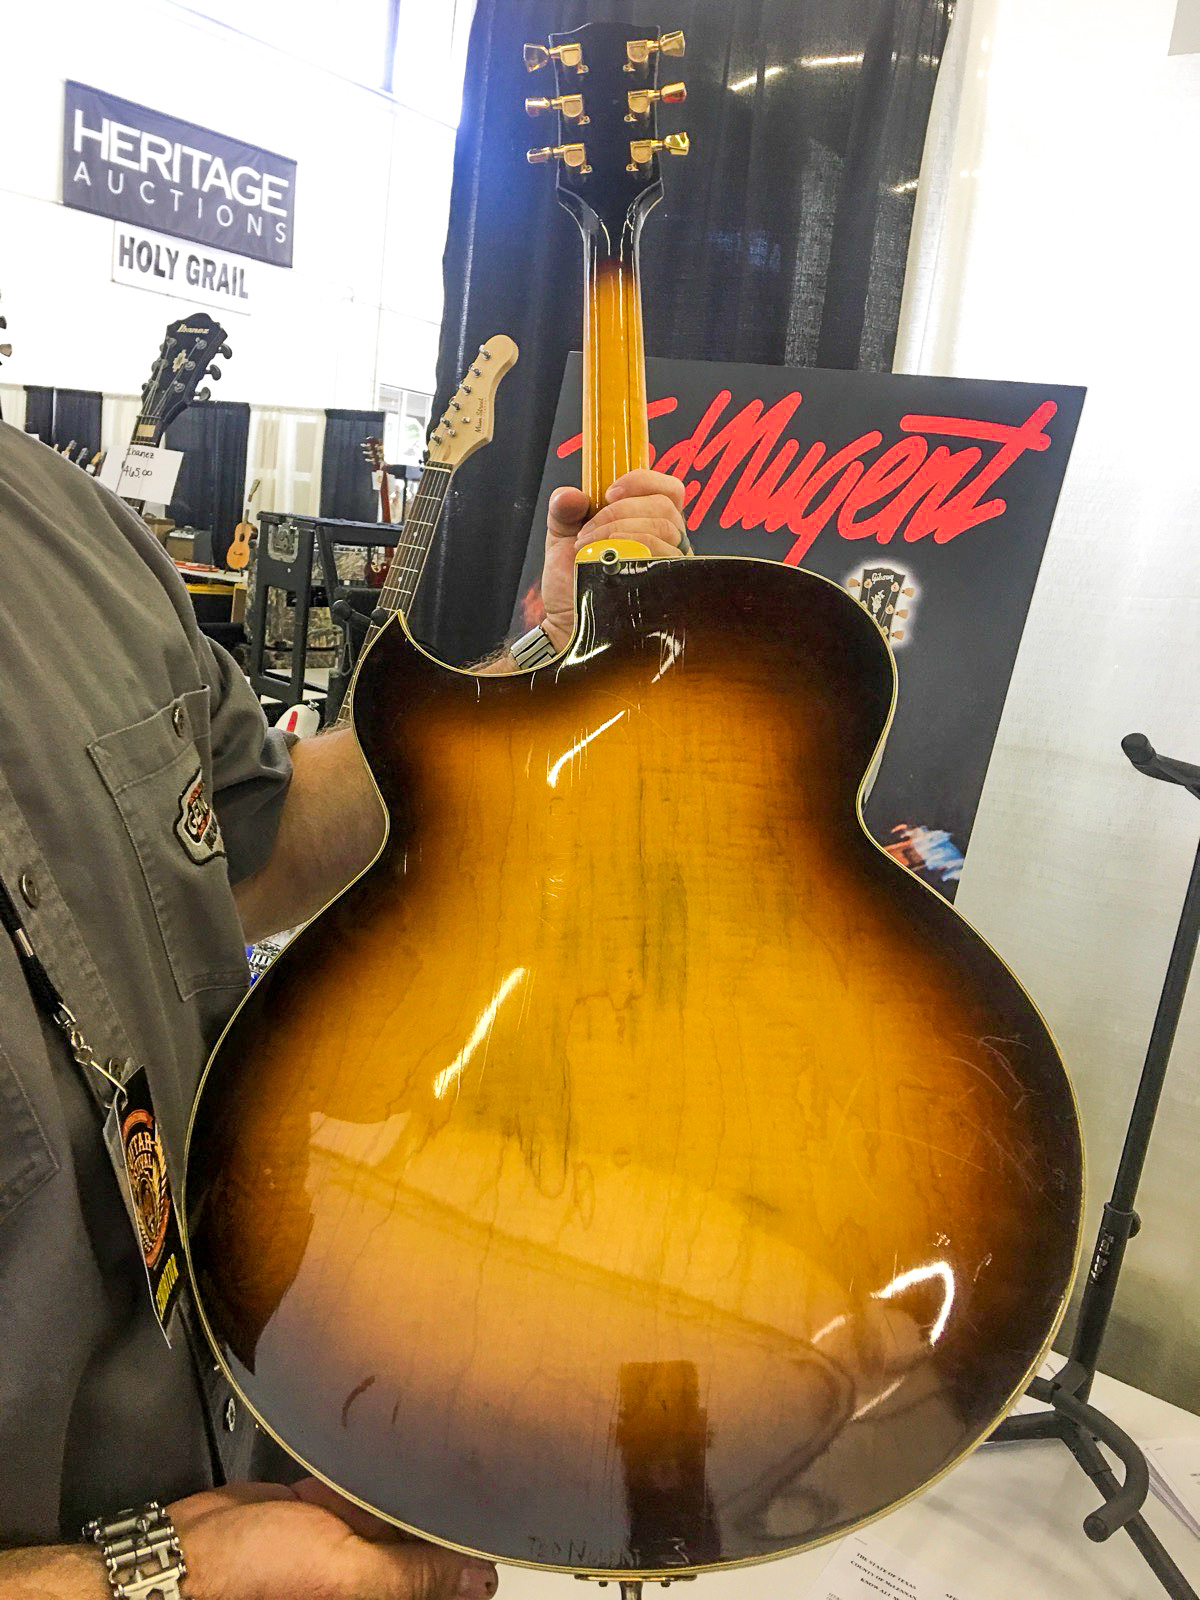 gibson byrdland guitar #3 Ted Nugent